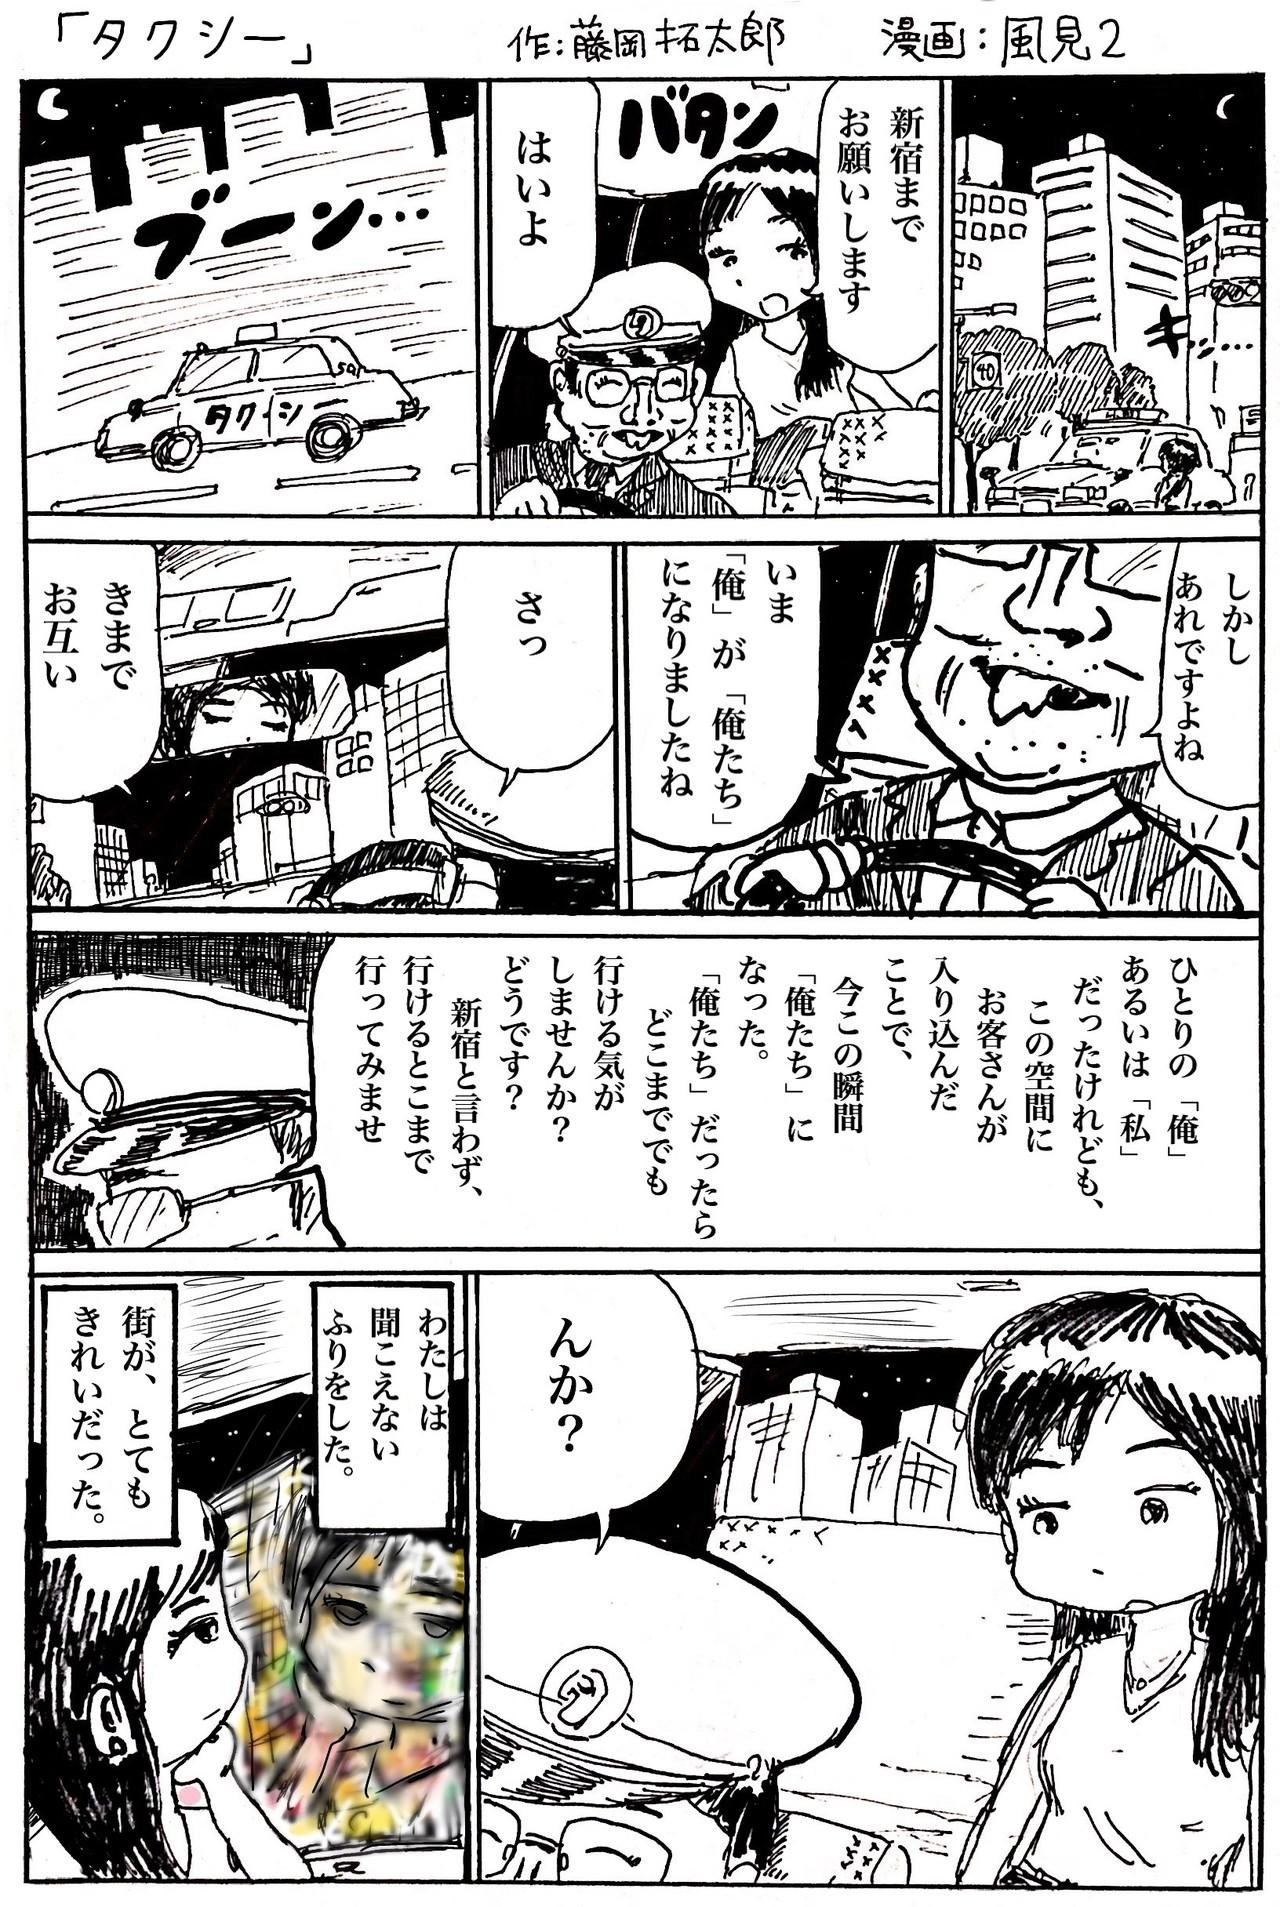 20180730_1ページ漫画_タクシー__原作_藤岡拓太郎_漫画_風見2_